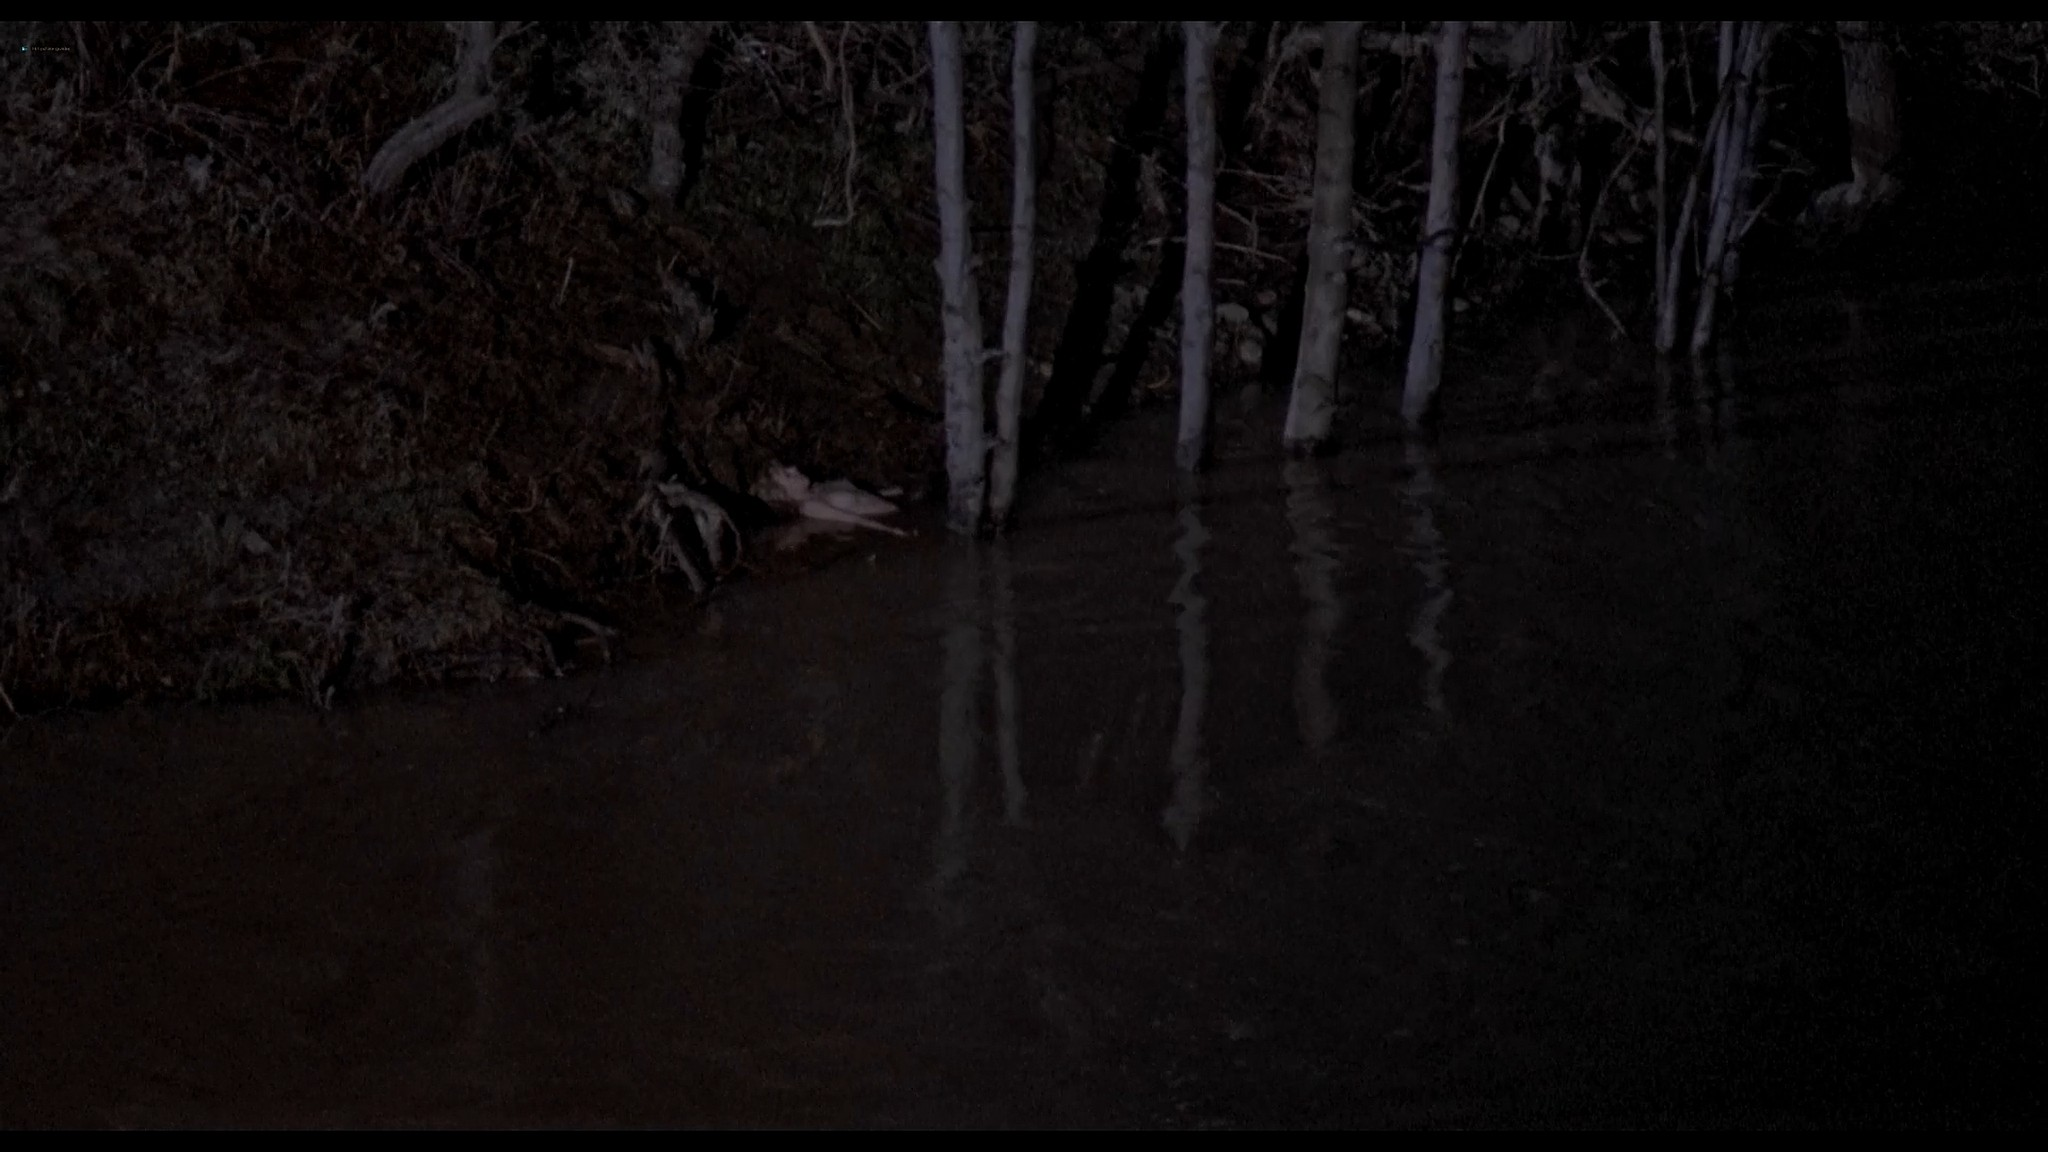 Danyi Deats nude bush topless but dead Rivers Edge 1986 HD 1080p BluRay 2